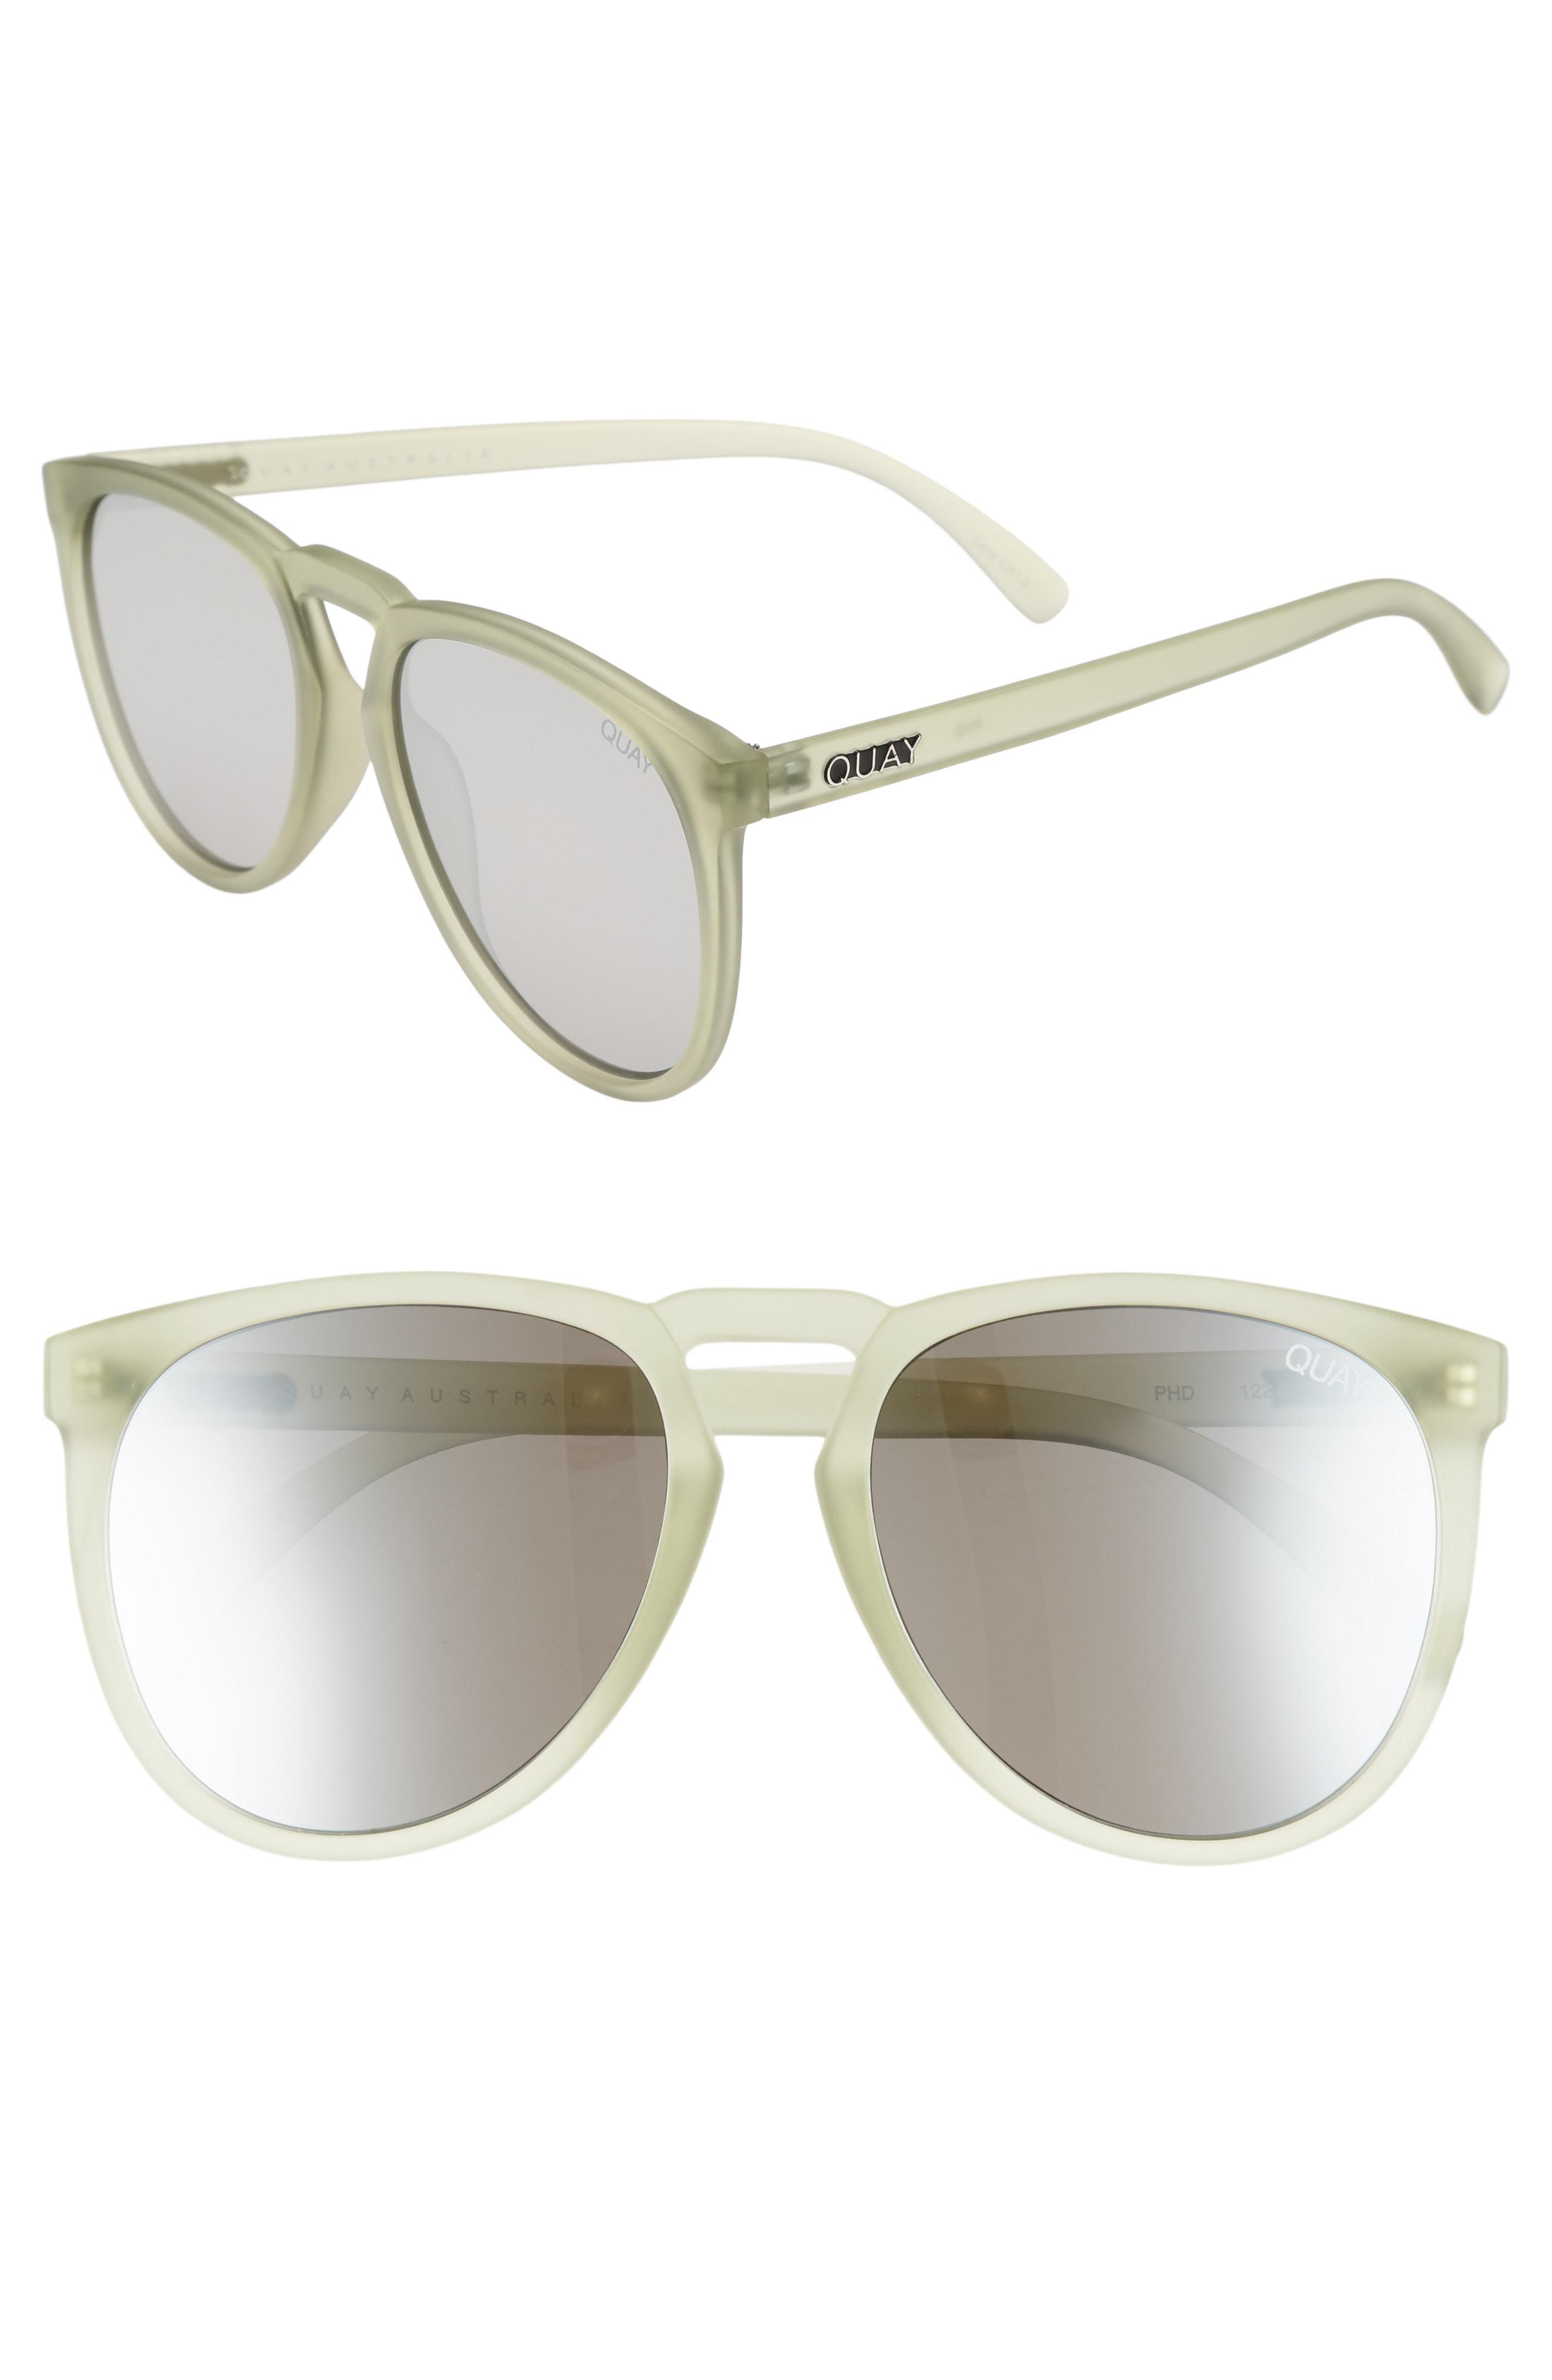 109d4162ad Quay - Metallic Phd 56mm Sunglasses - Olive  Silver for Men - Lyst. View  fullscreen